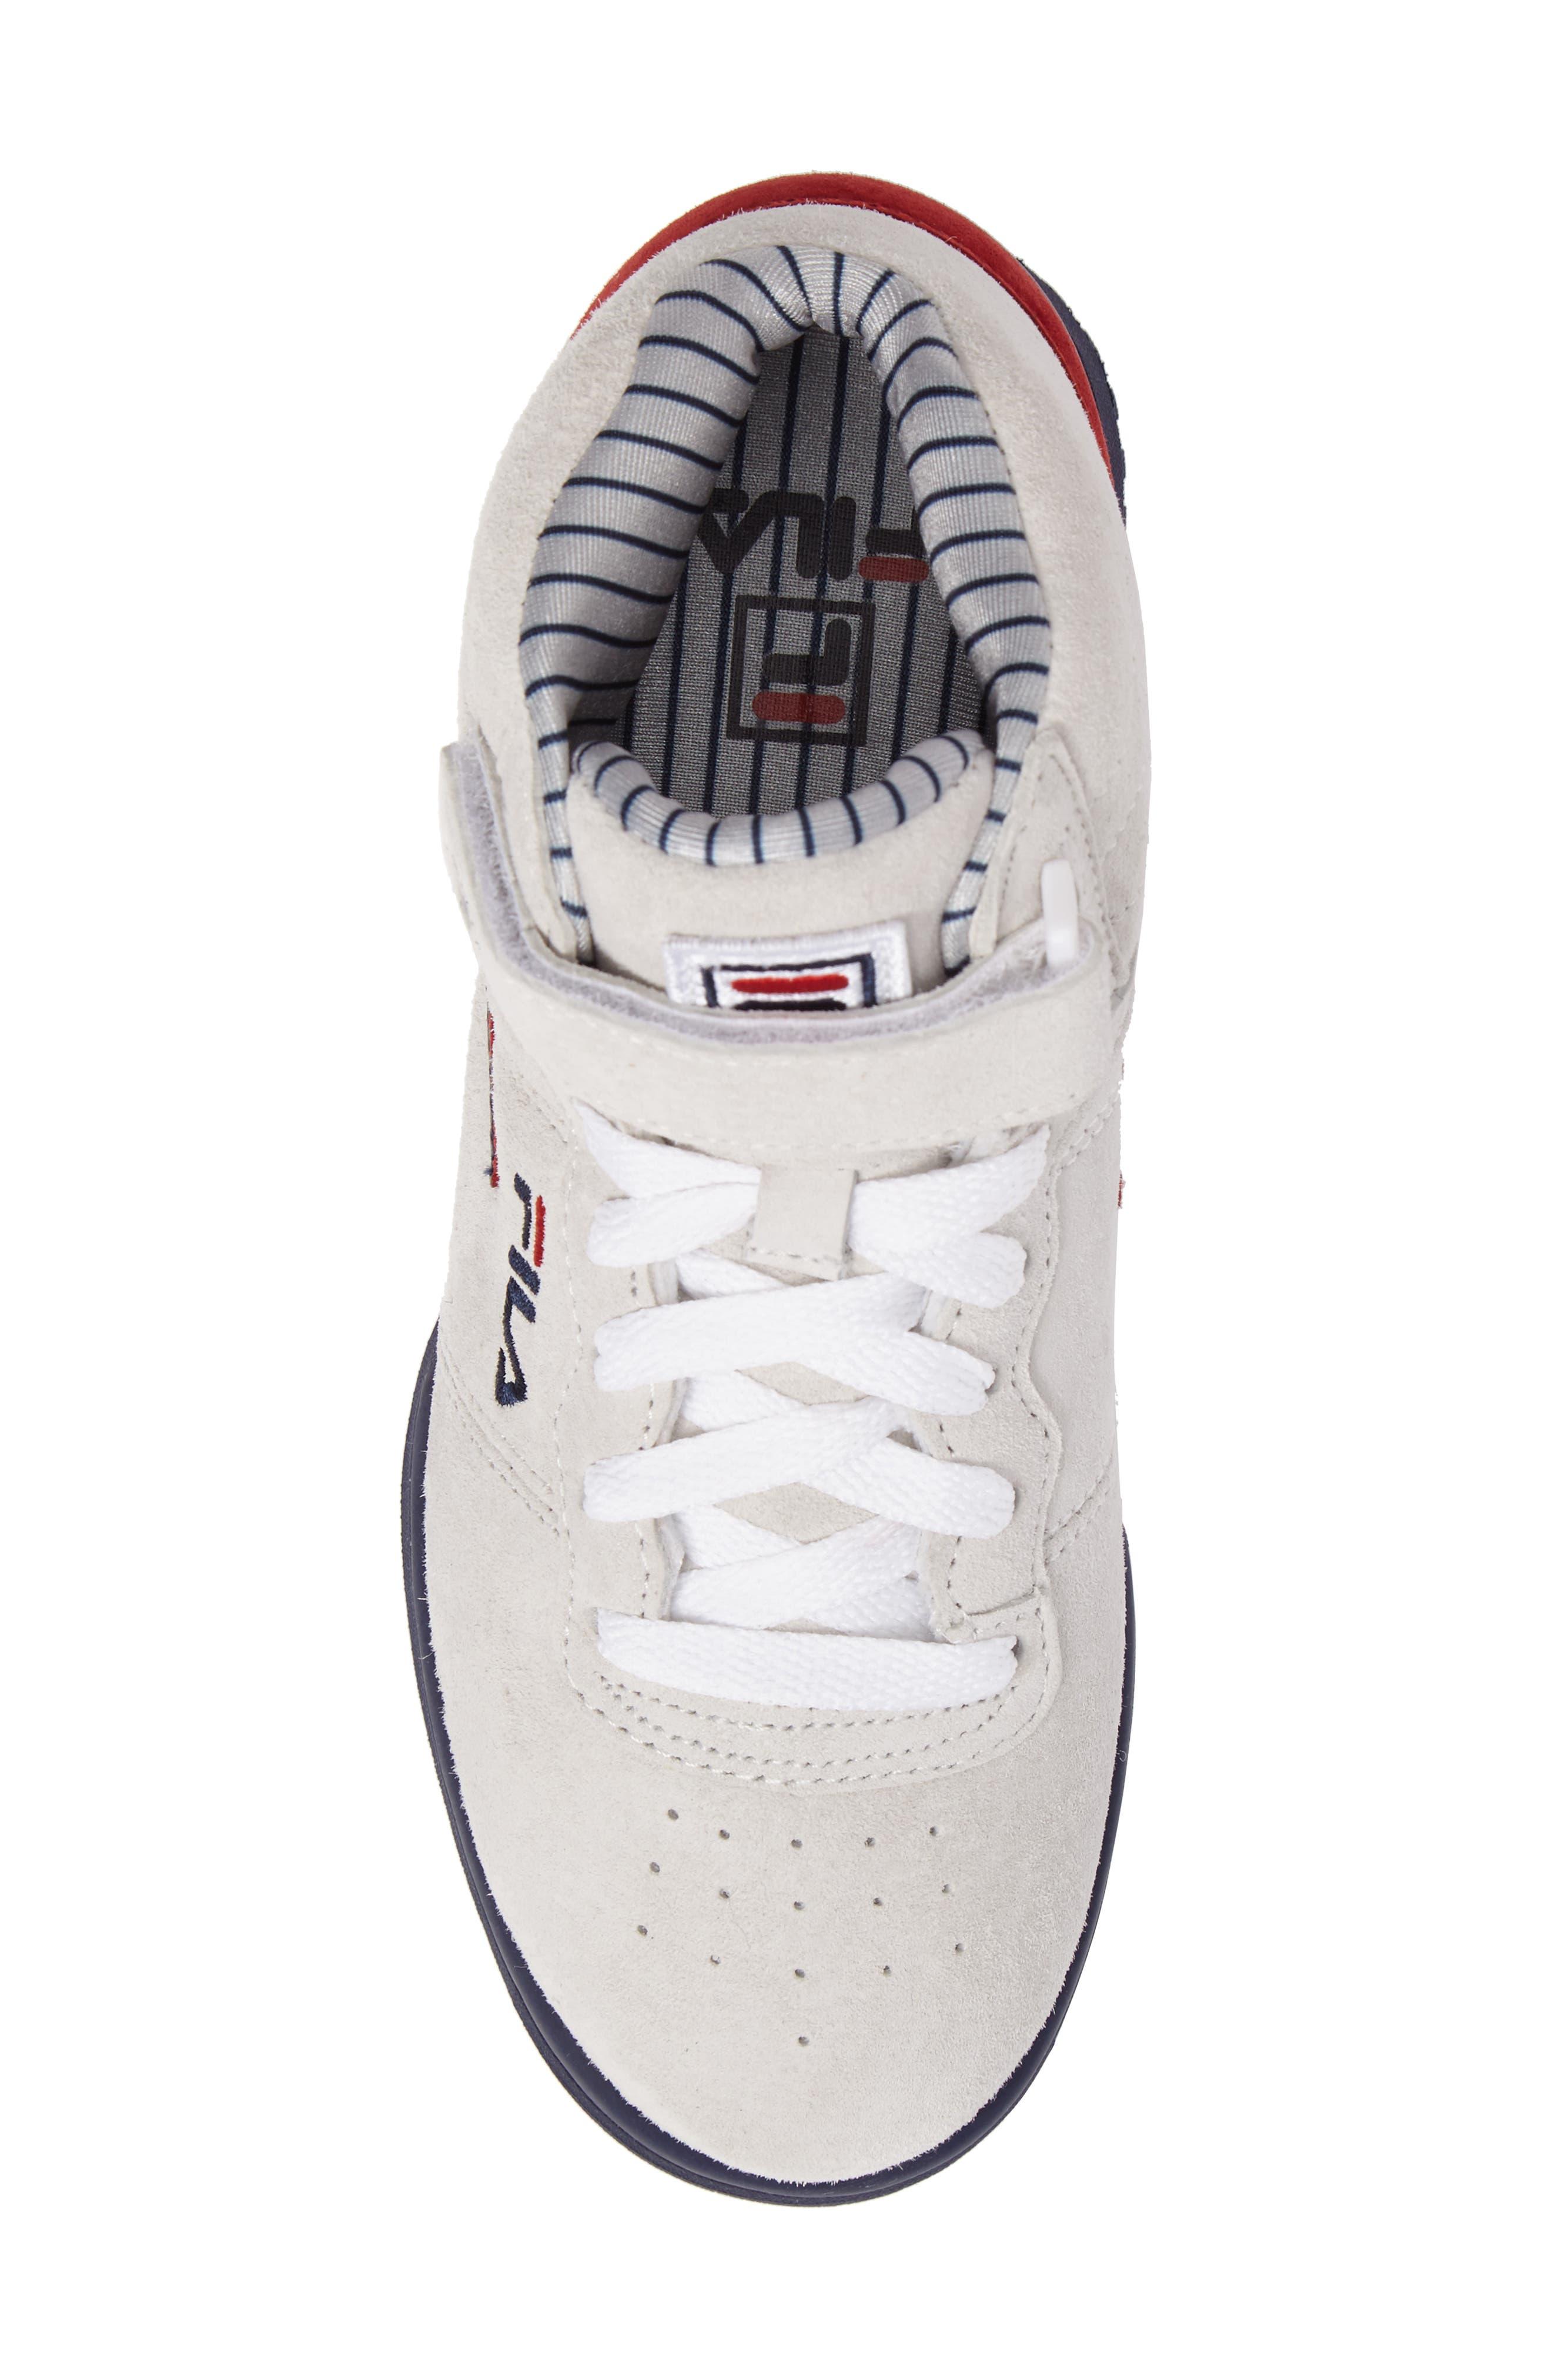 FILA, F-13 Mid Pinstripe Sneaker, Alternate thumbnail 5, color, 150